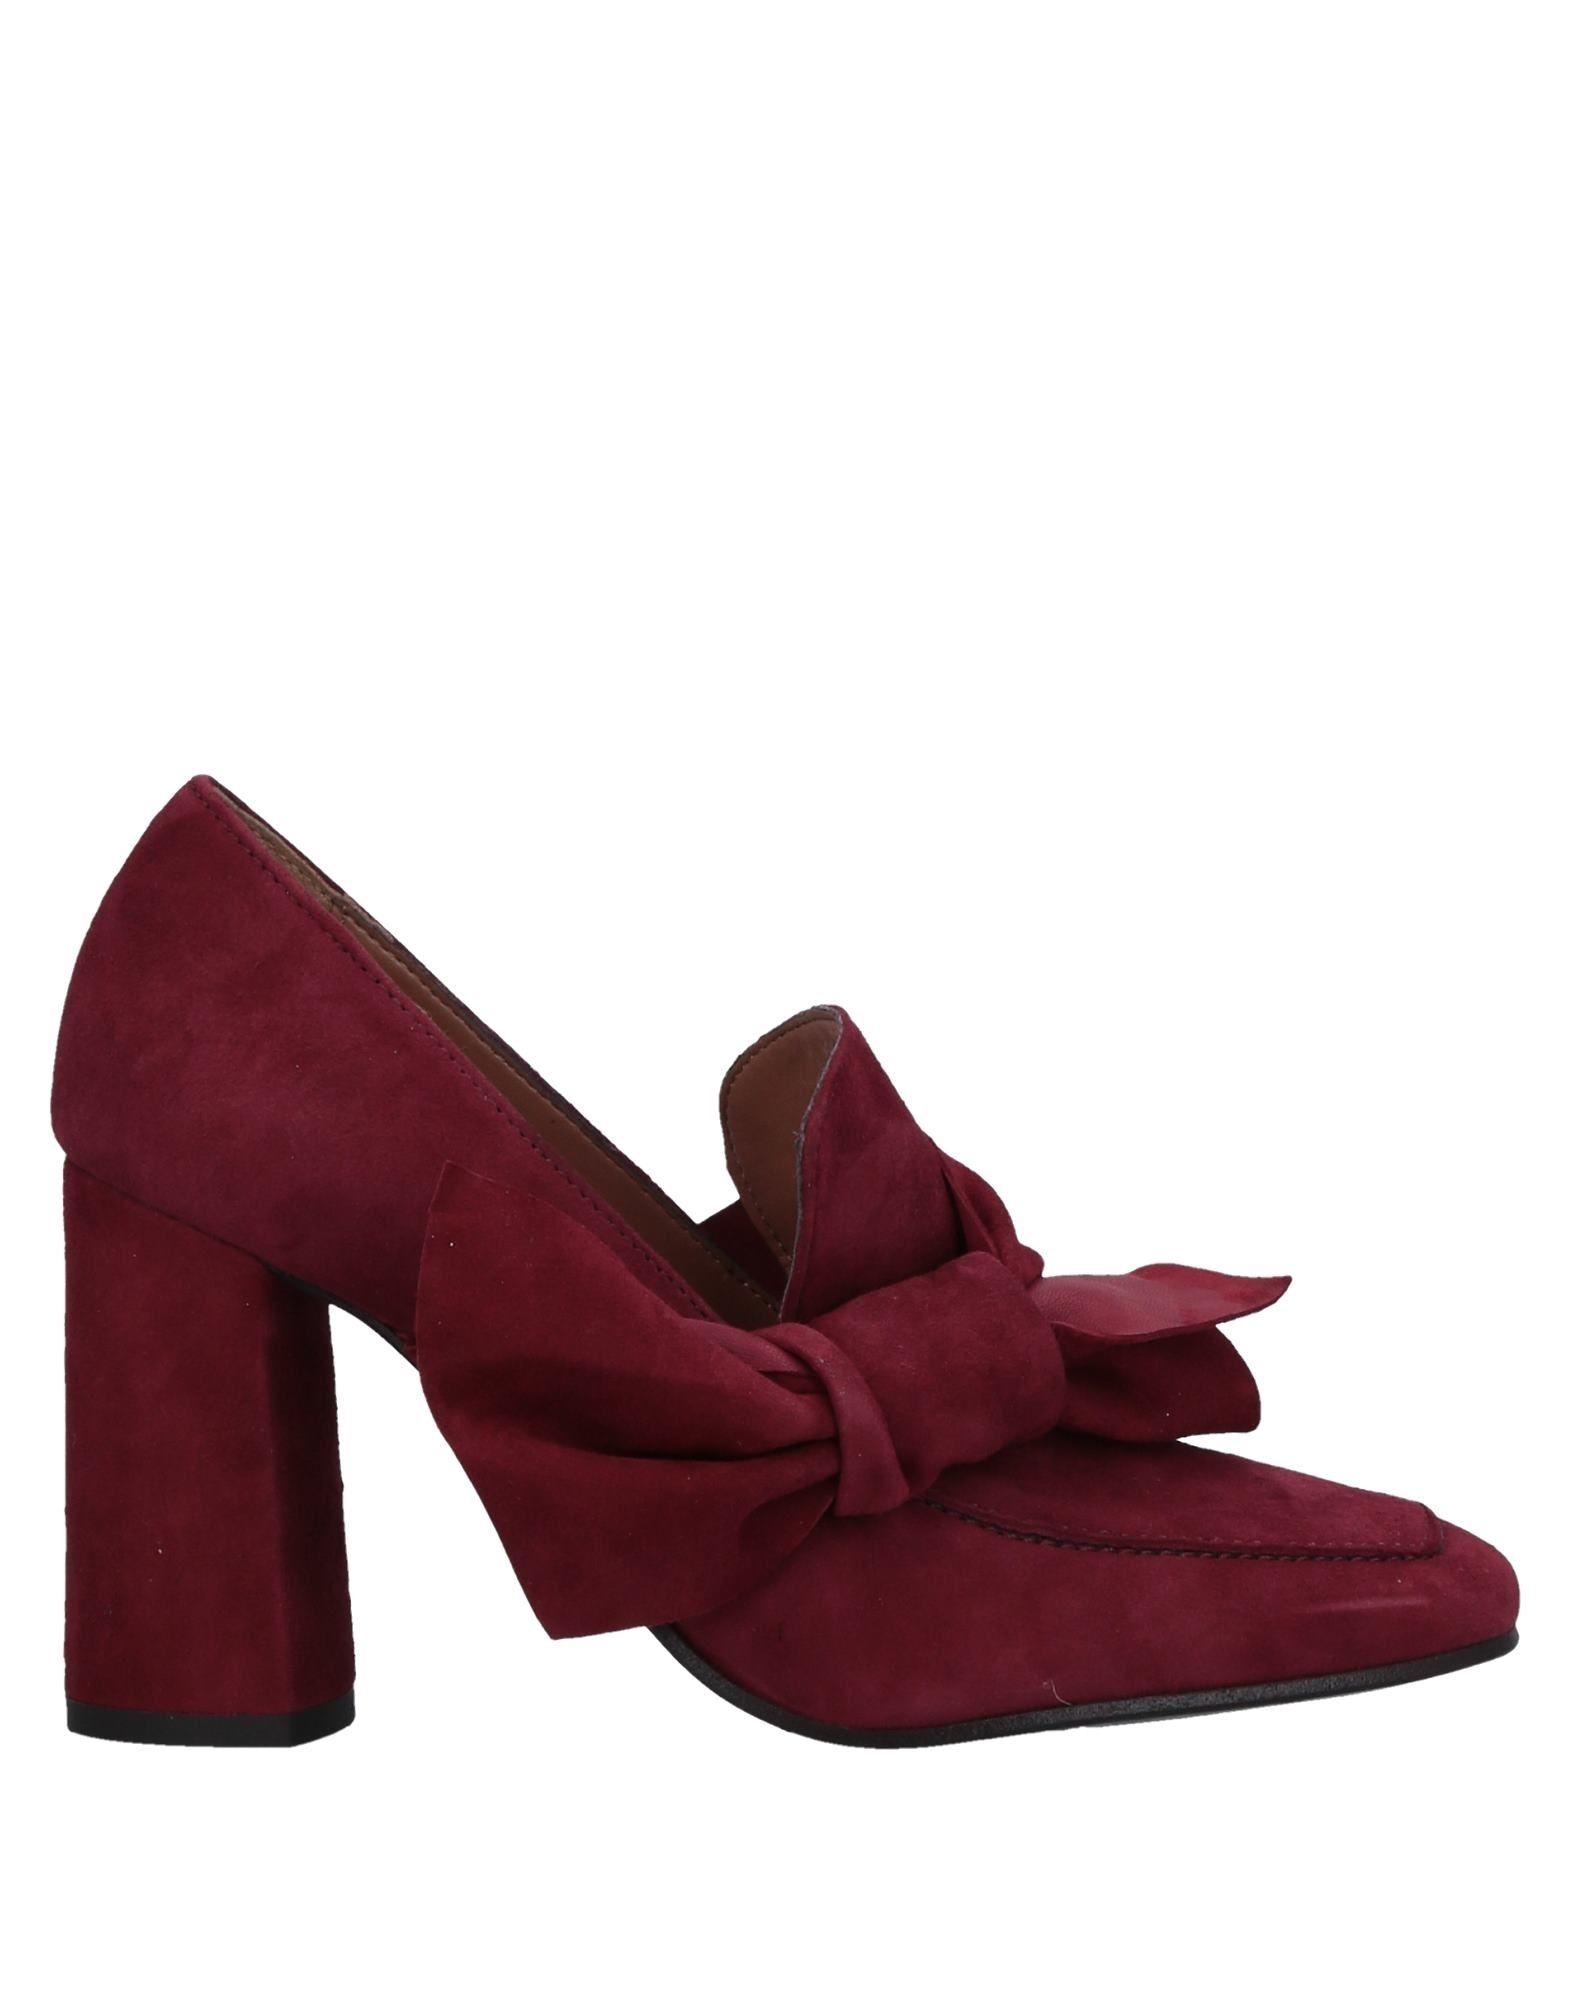 Eliana Bucci Bucci Loafers - Women Eliana Bucci Bucci Loafers online on  Australia - 11532223CT 9f40f2